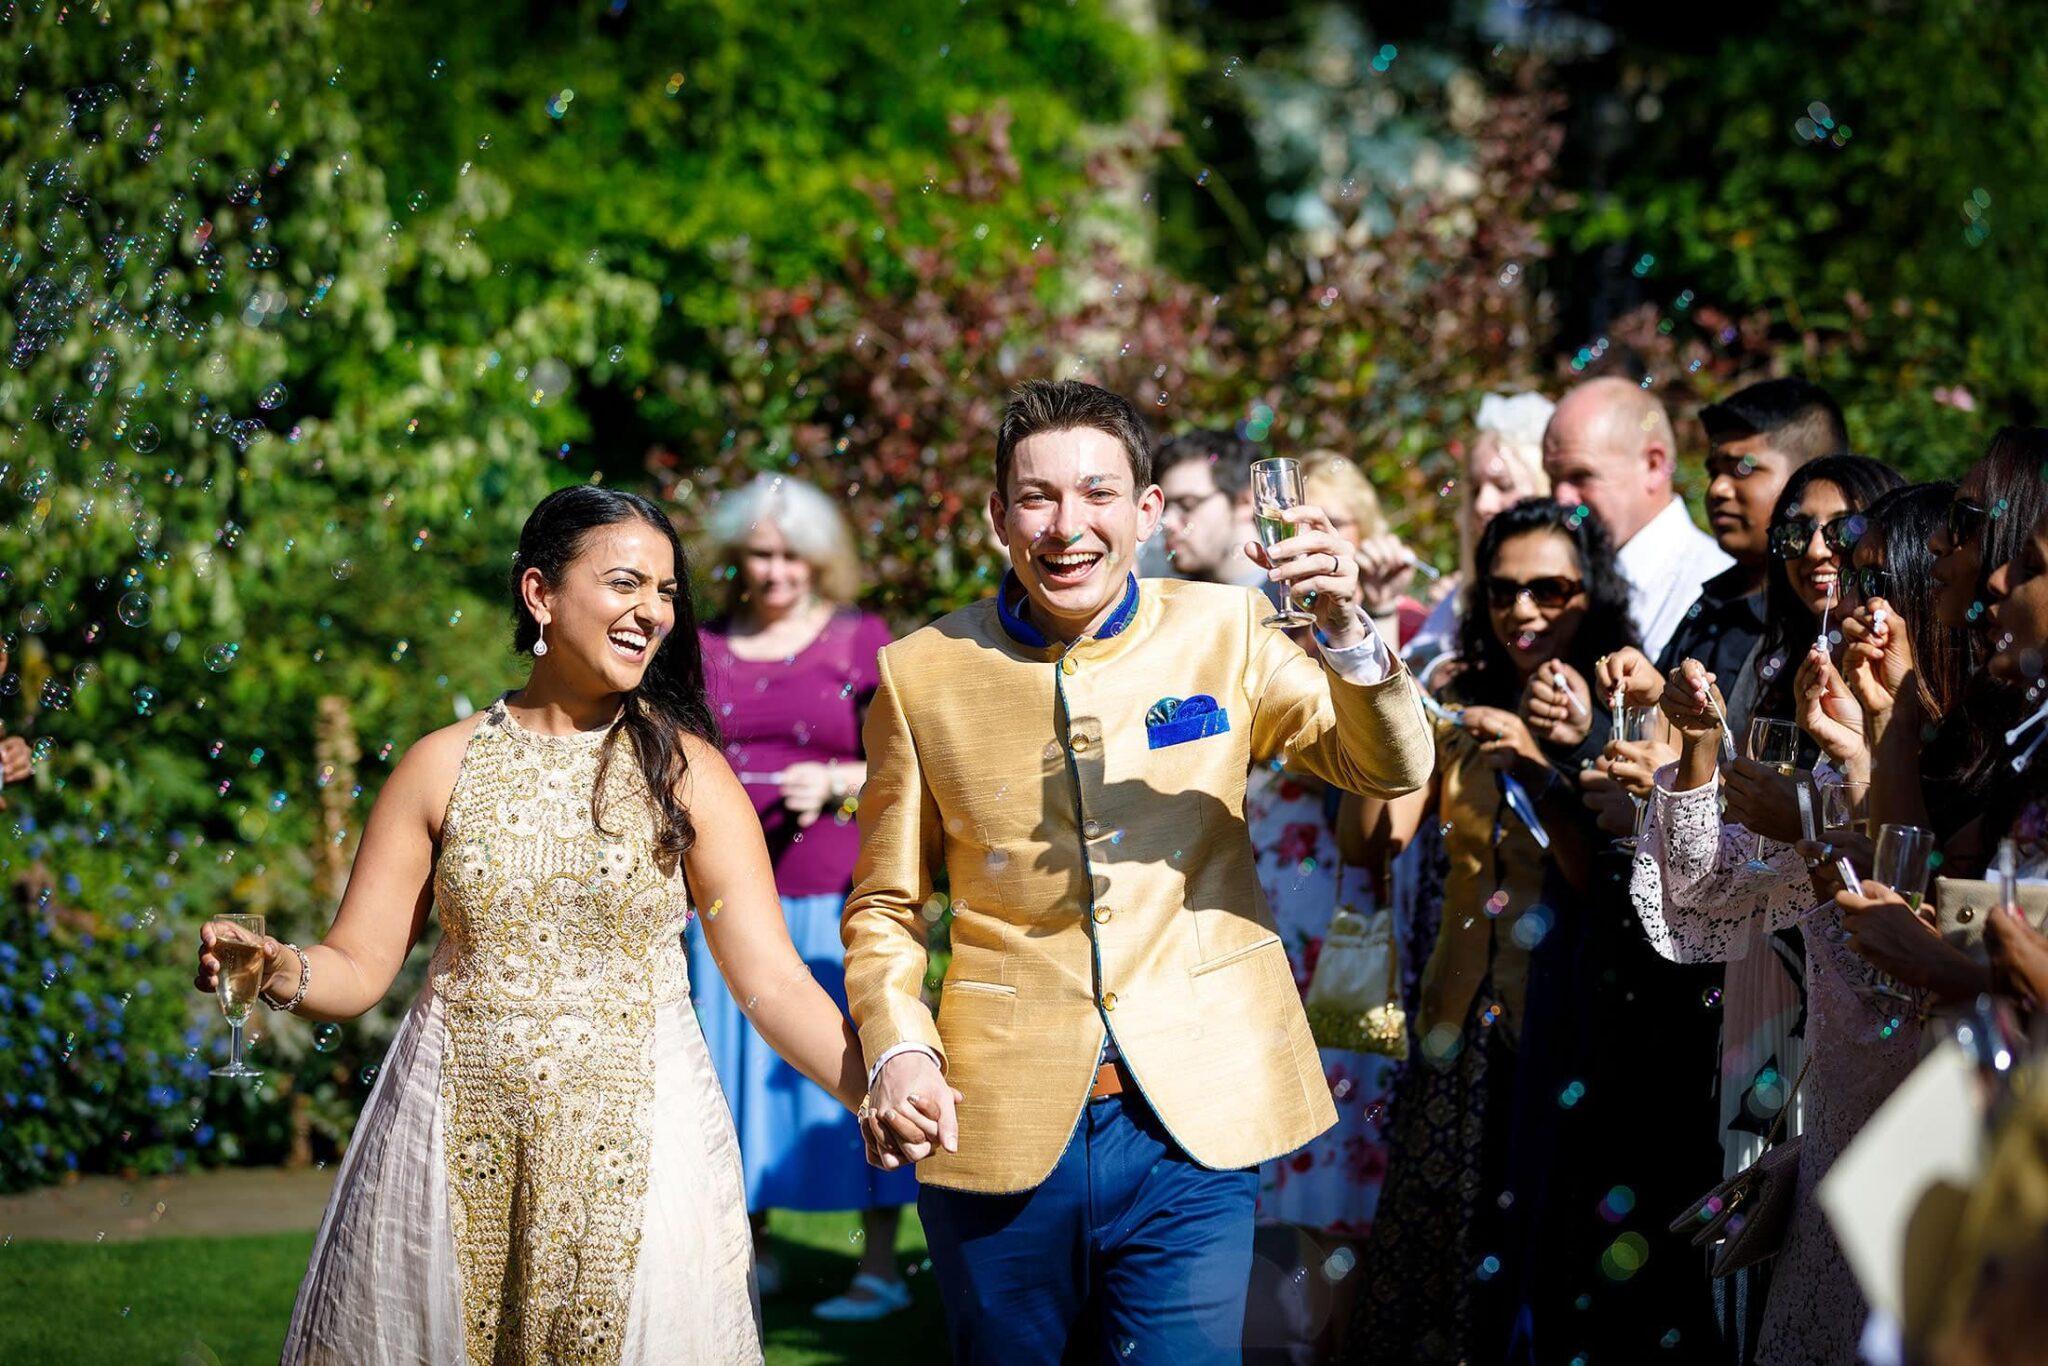 Anstey Hall wedding of Nams & Chris